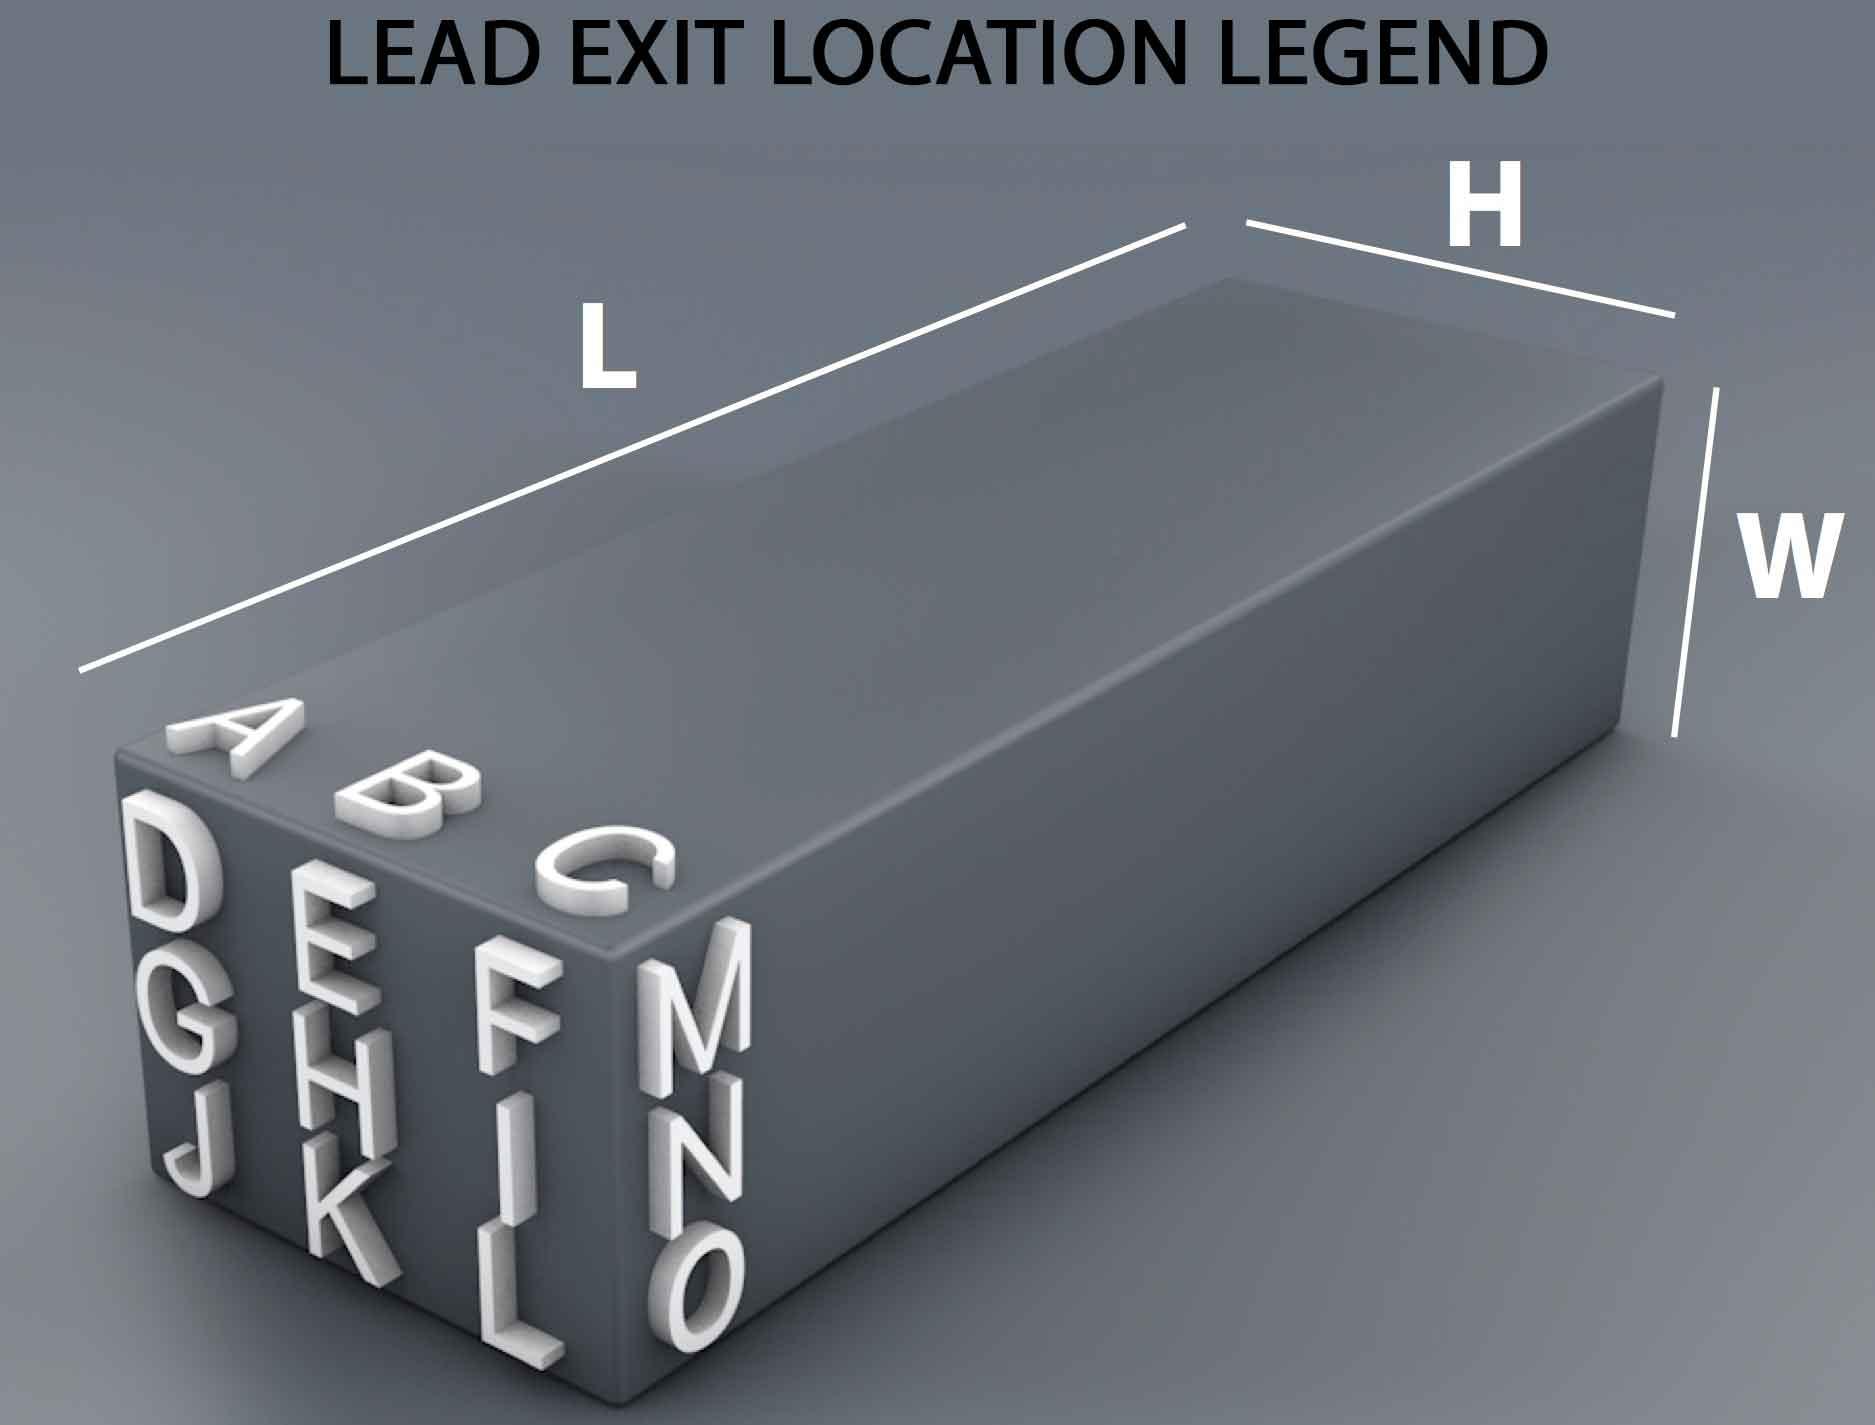 Lead Exit Location Legend